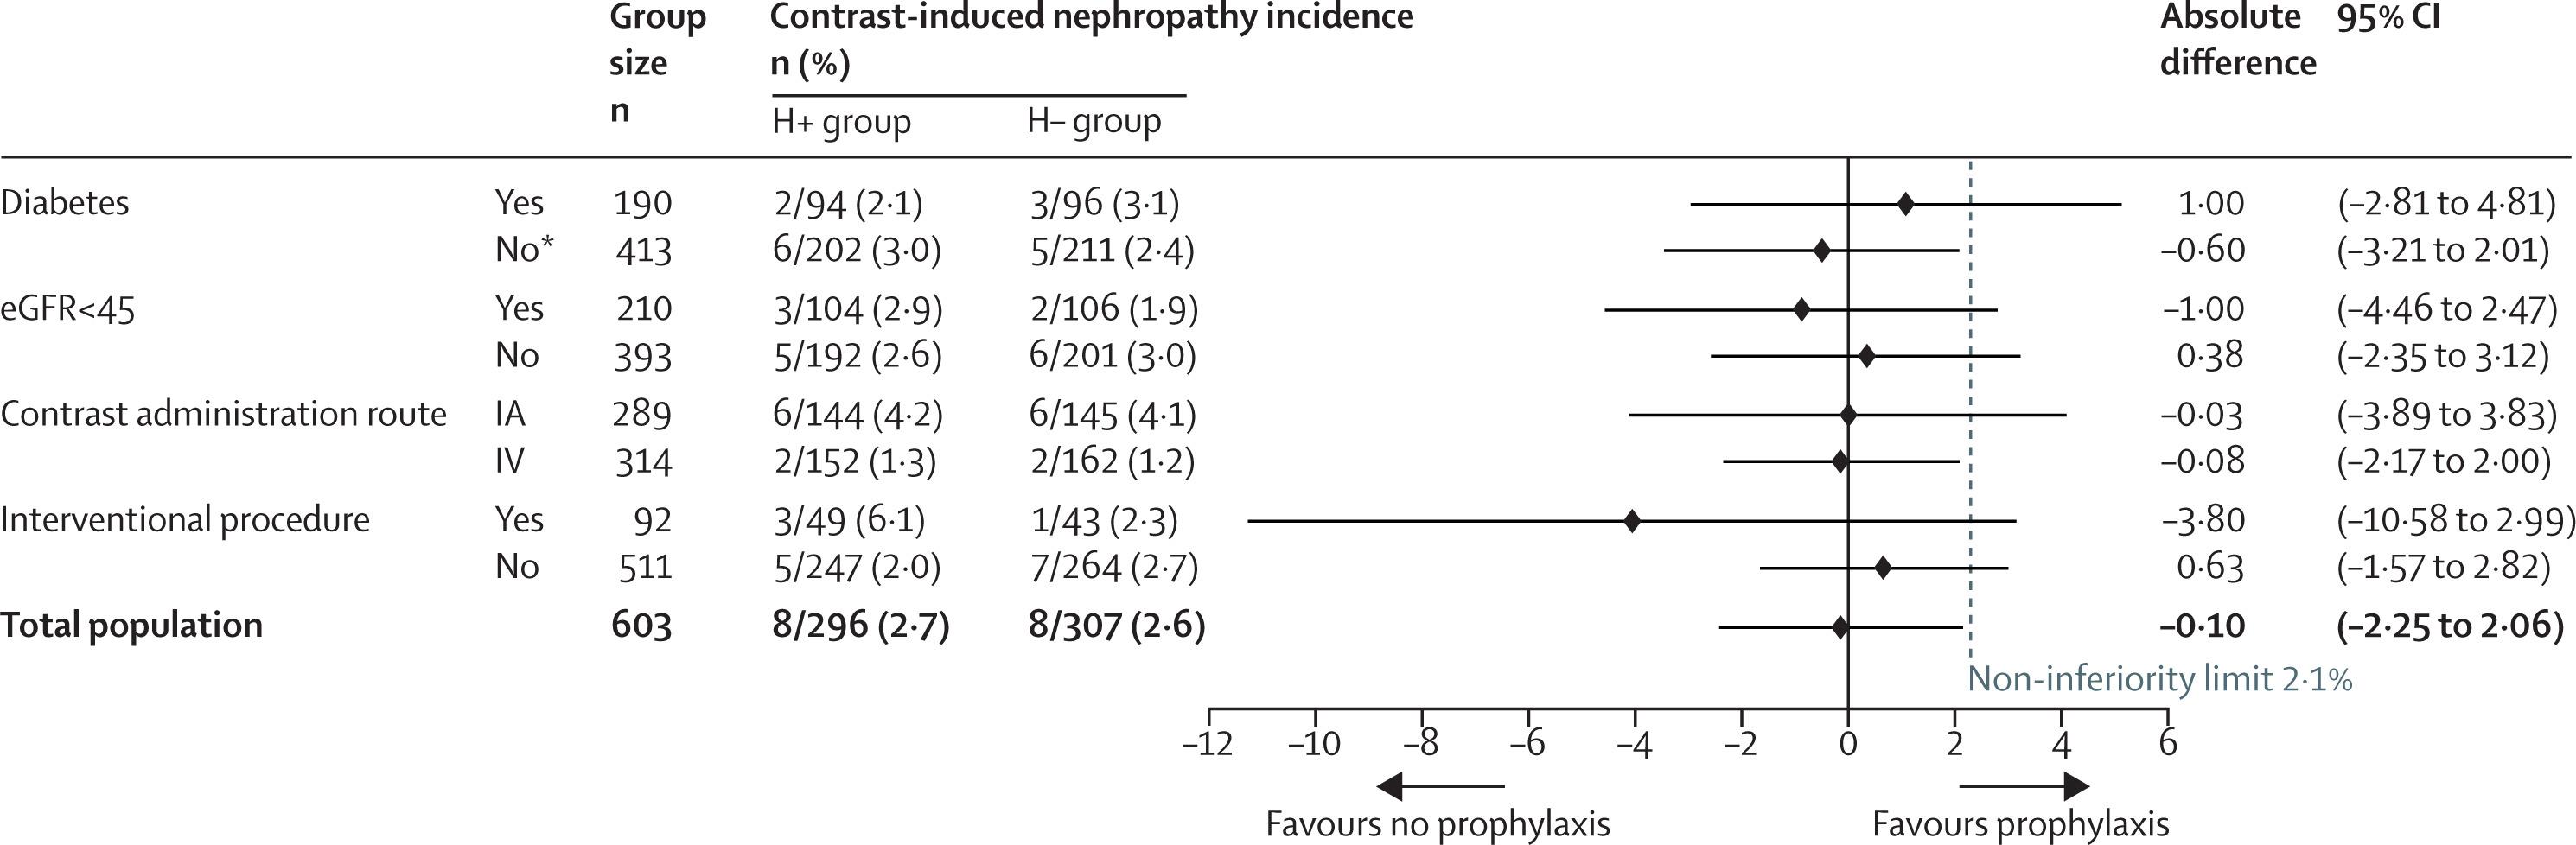 [Lancet在线发表]:静脉水化不能预防高危患者的造影剂肾病